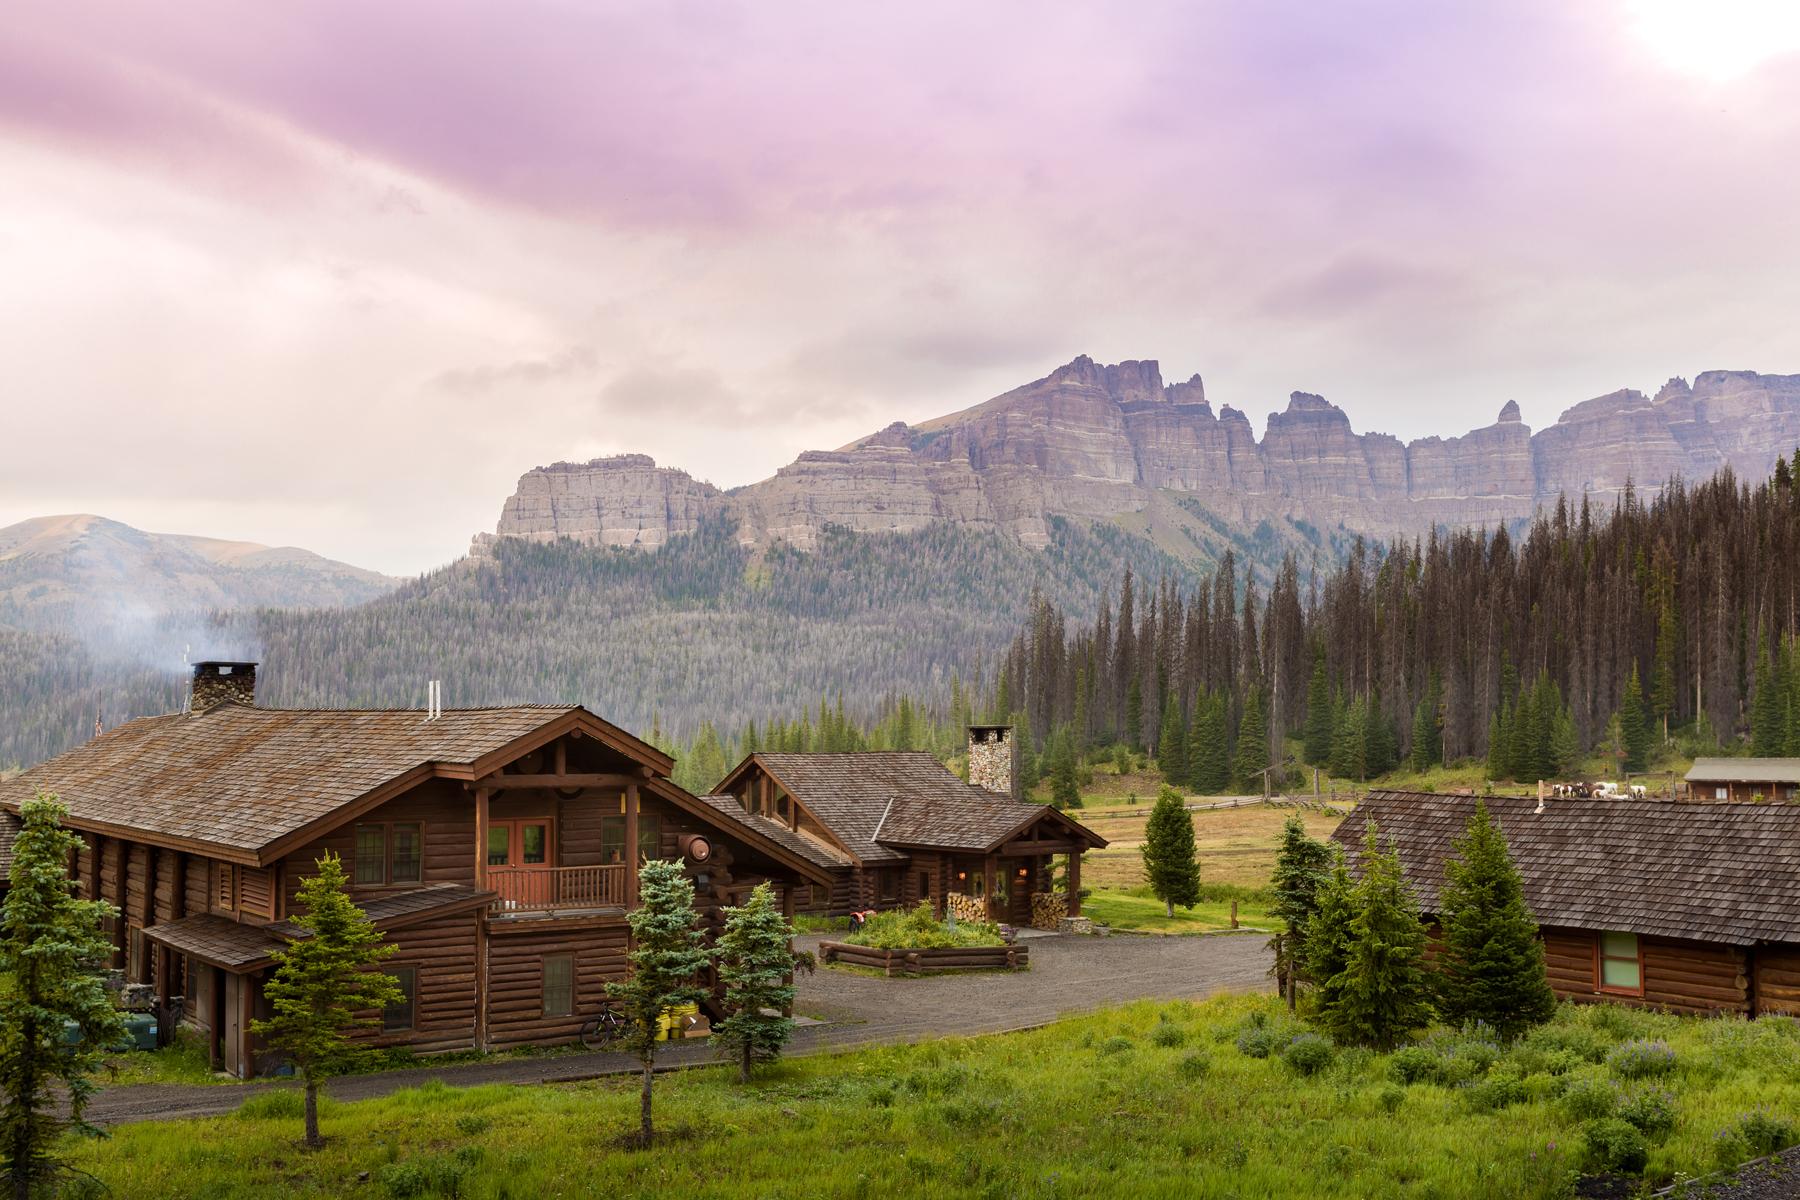 brooks lake lodge  u0026 spa reveals four fabulous fall travel reasons to visit the jackson hole area